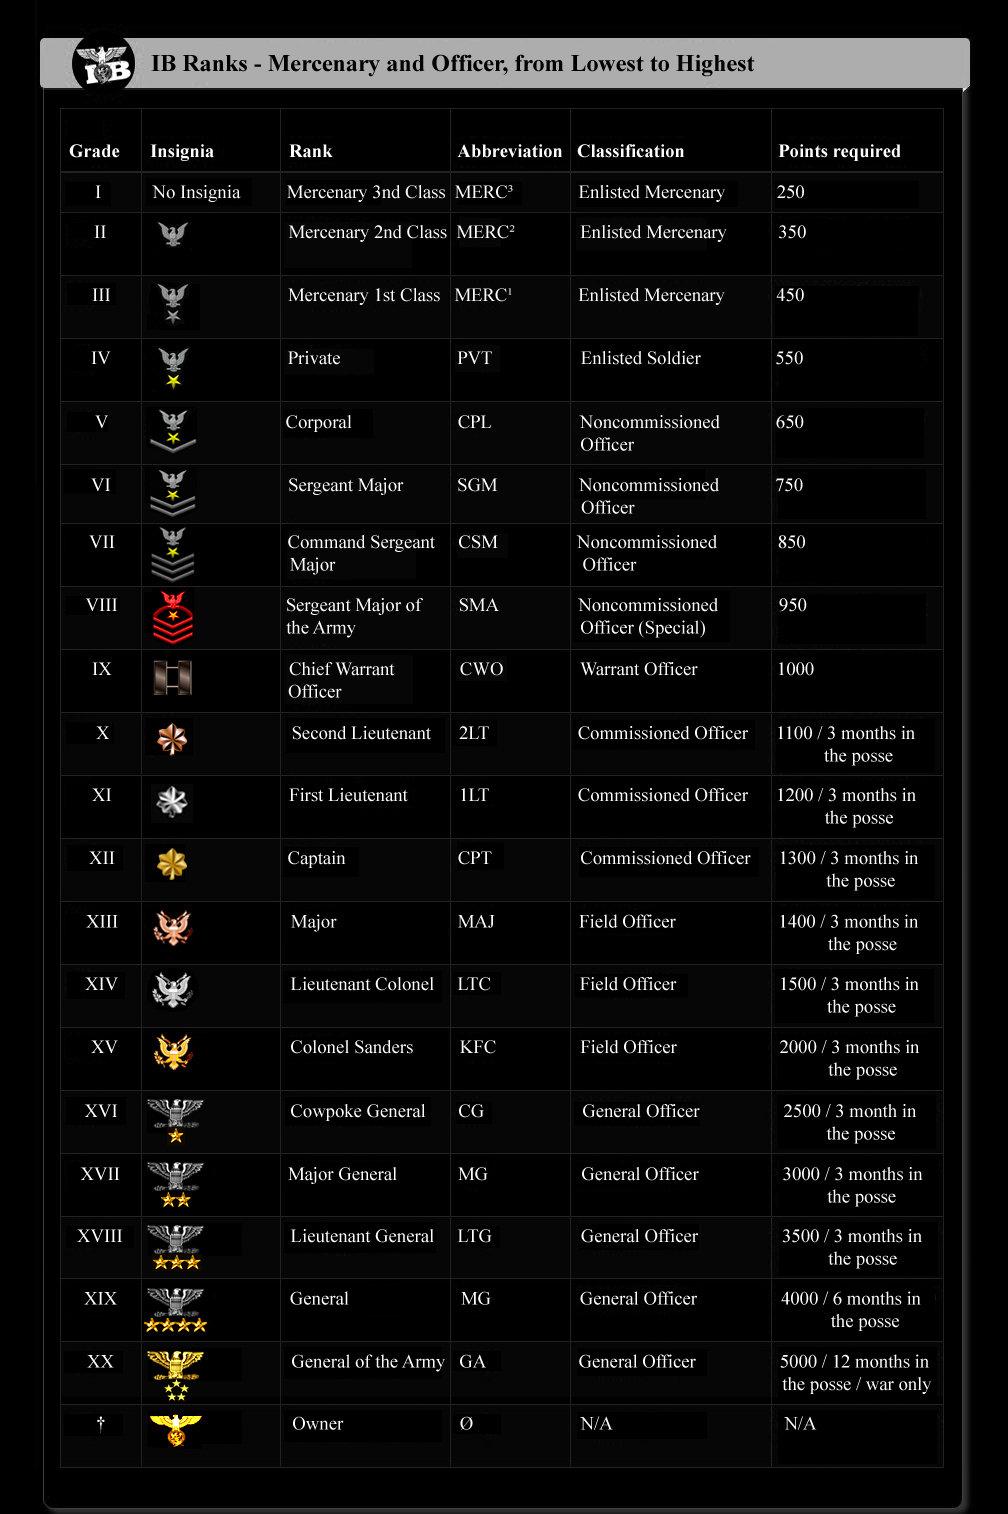 IB Ranking System